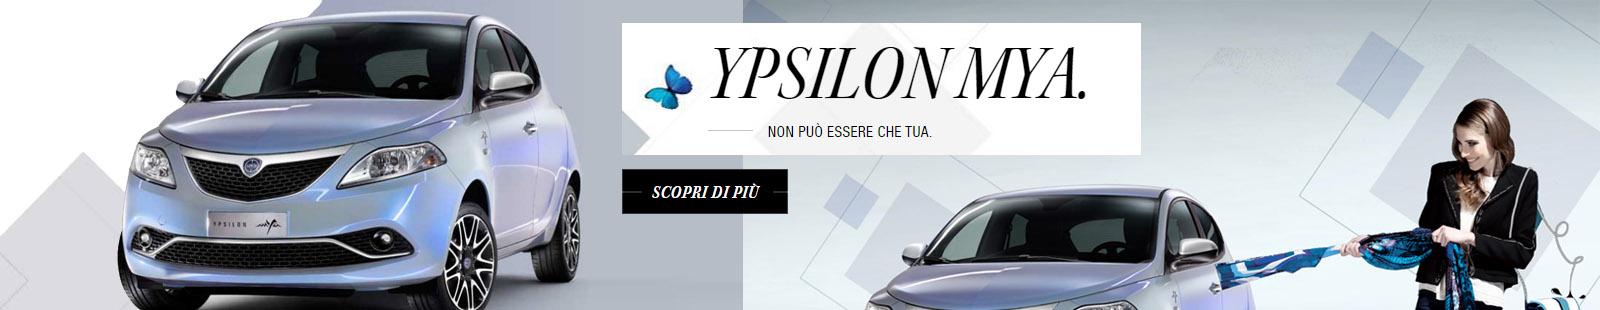 1605-ypsilon-mya